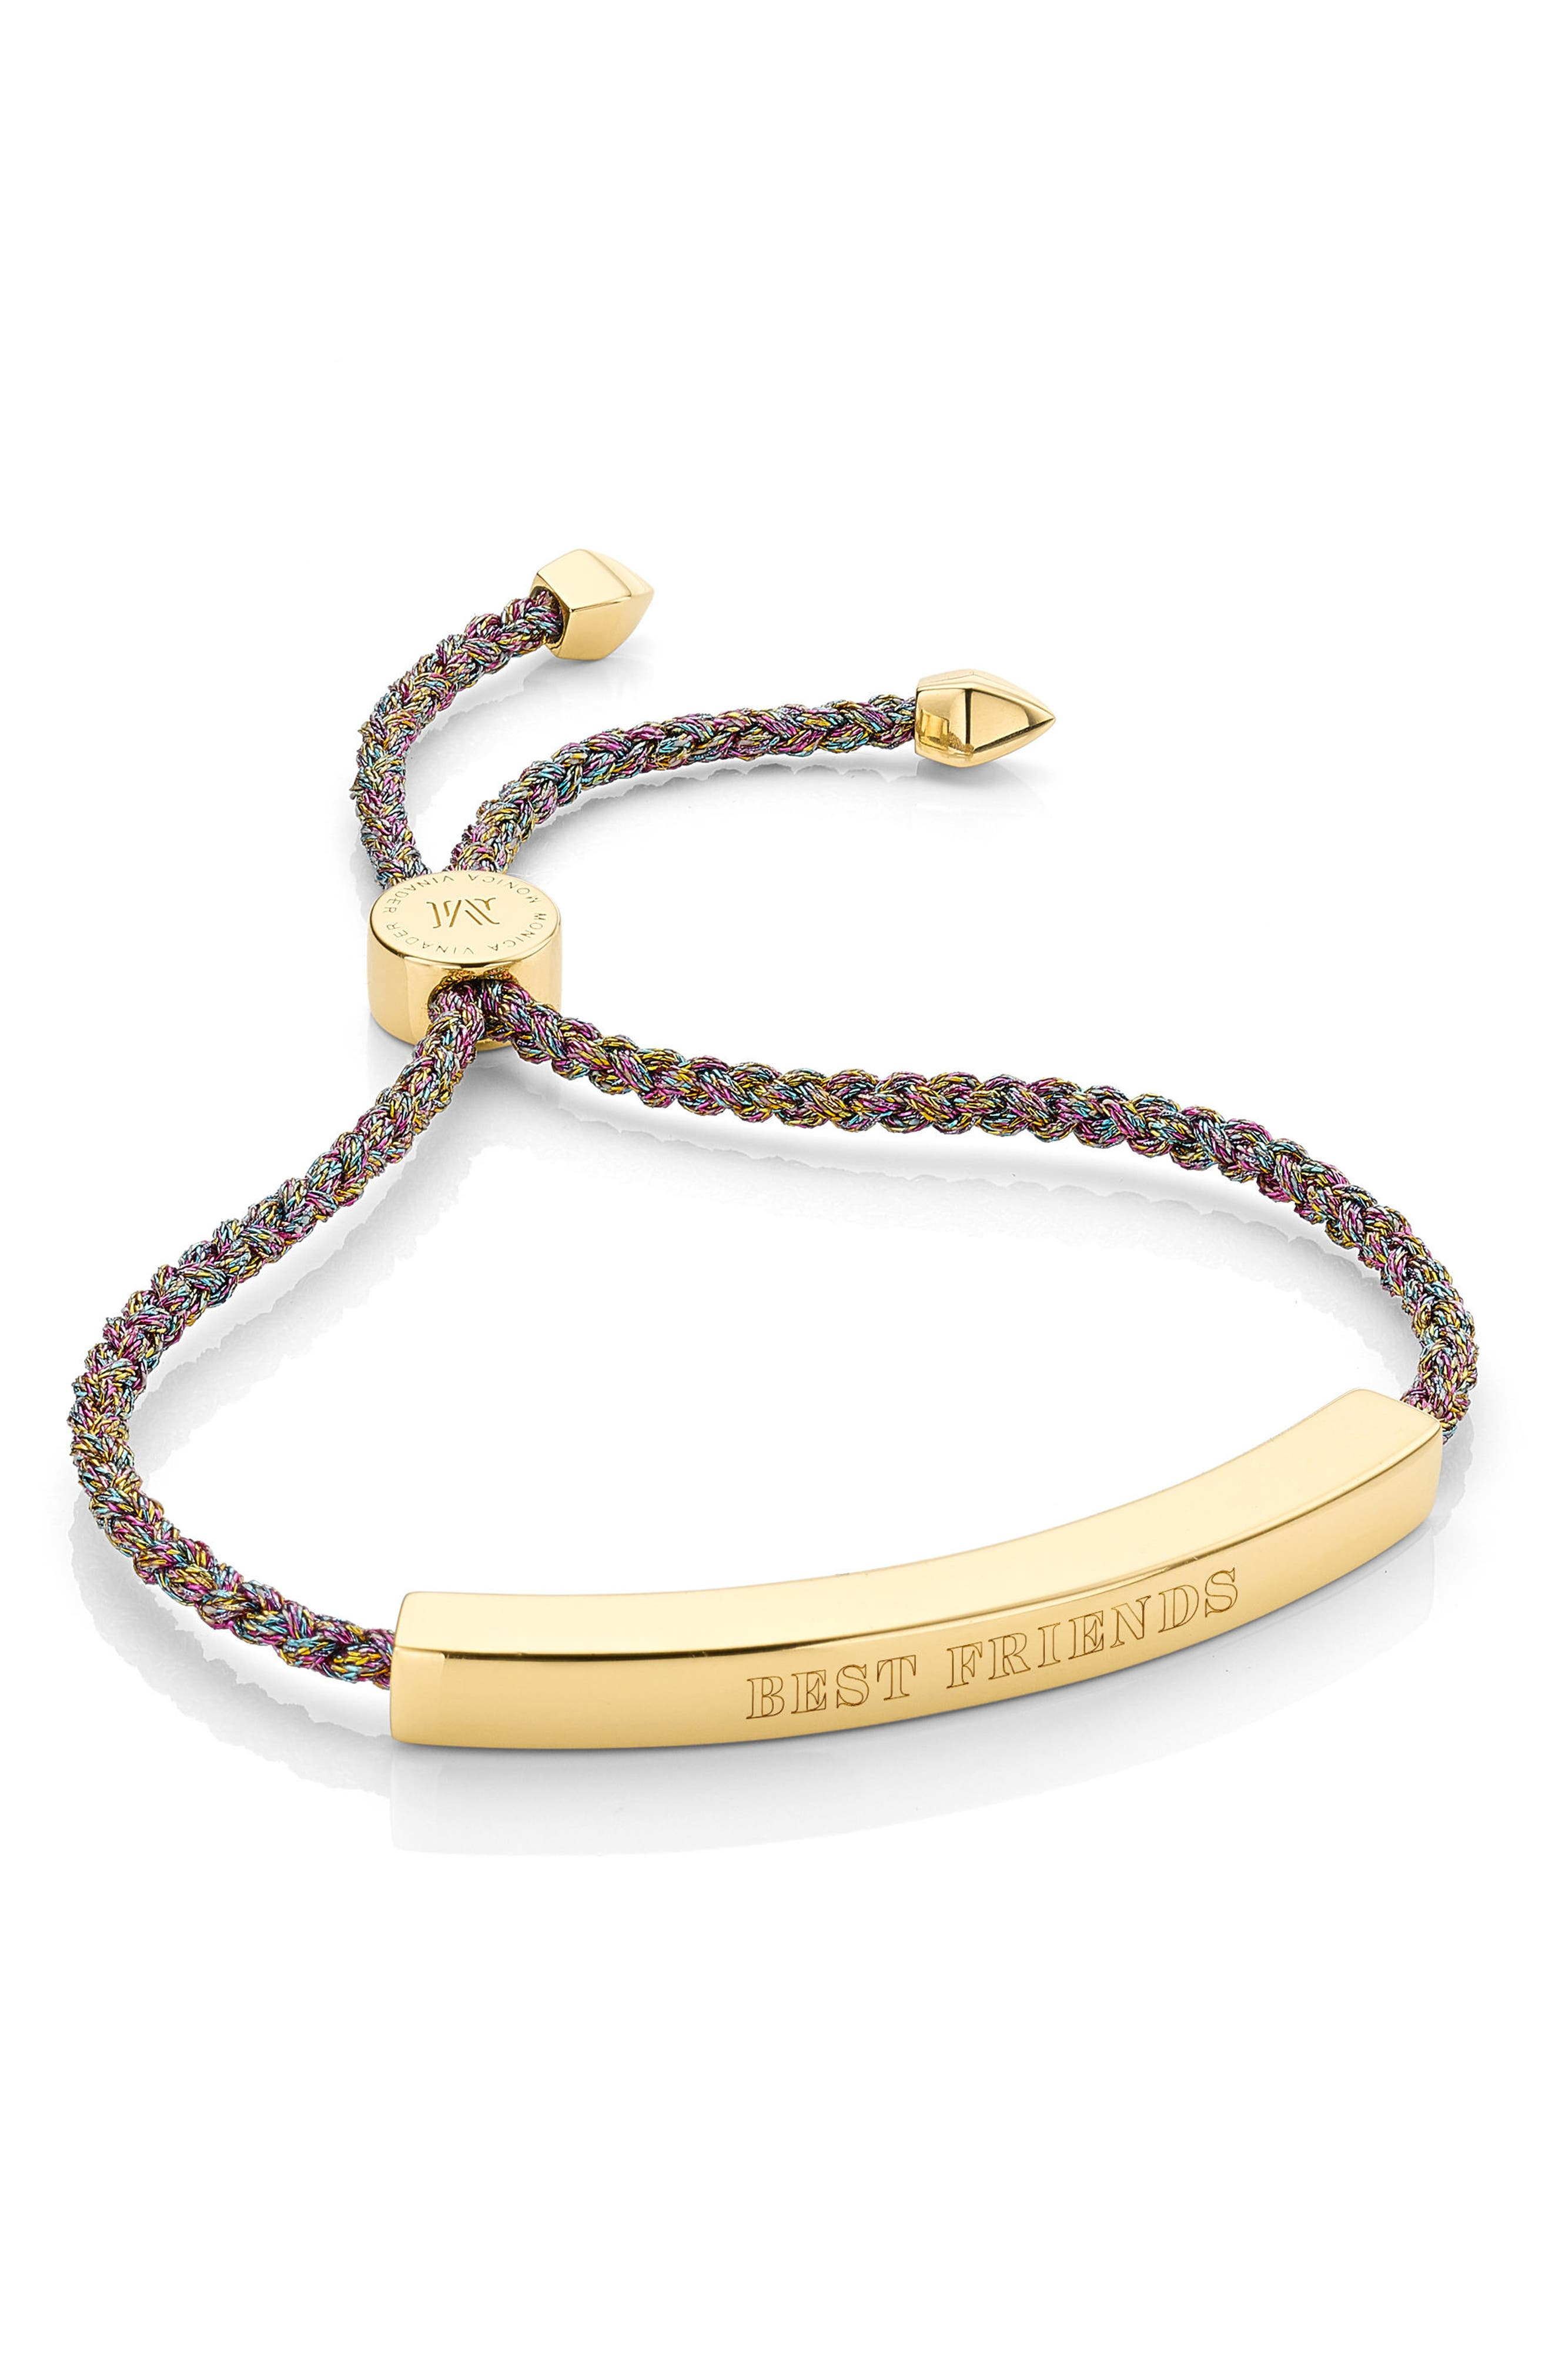 Engravable Large Linear Friendship Bracelet,                             Alternate thumbnail 3, color,                             RAINBOW METALLIC/ YELLOW GOLD